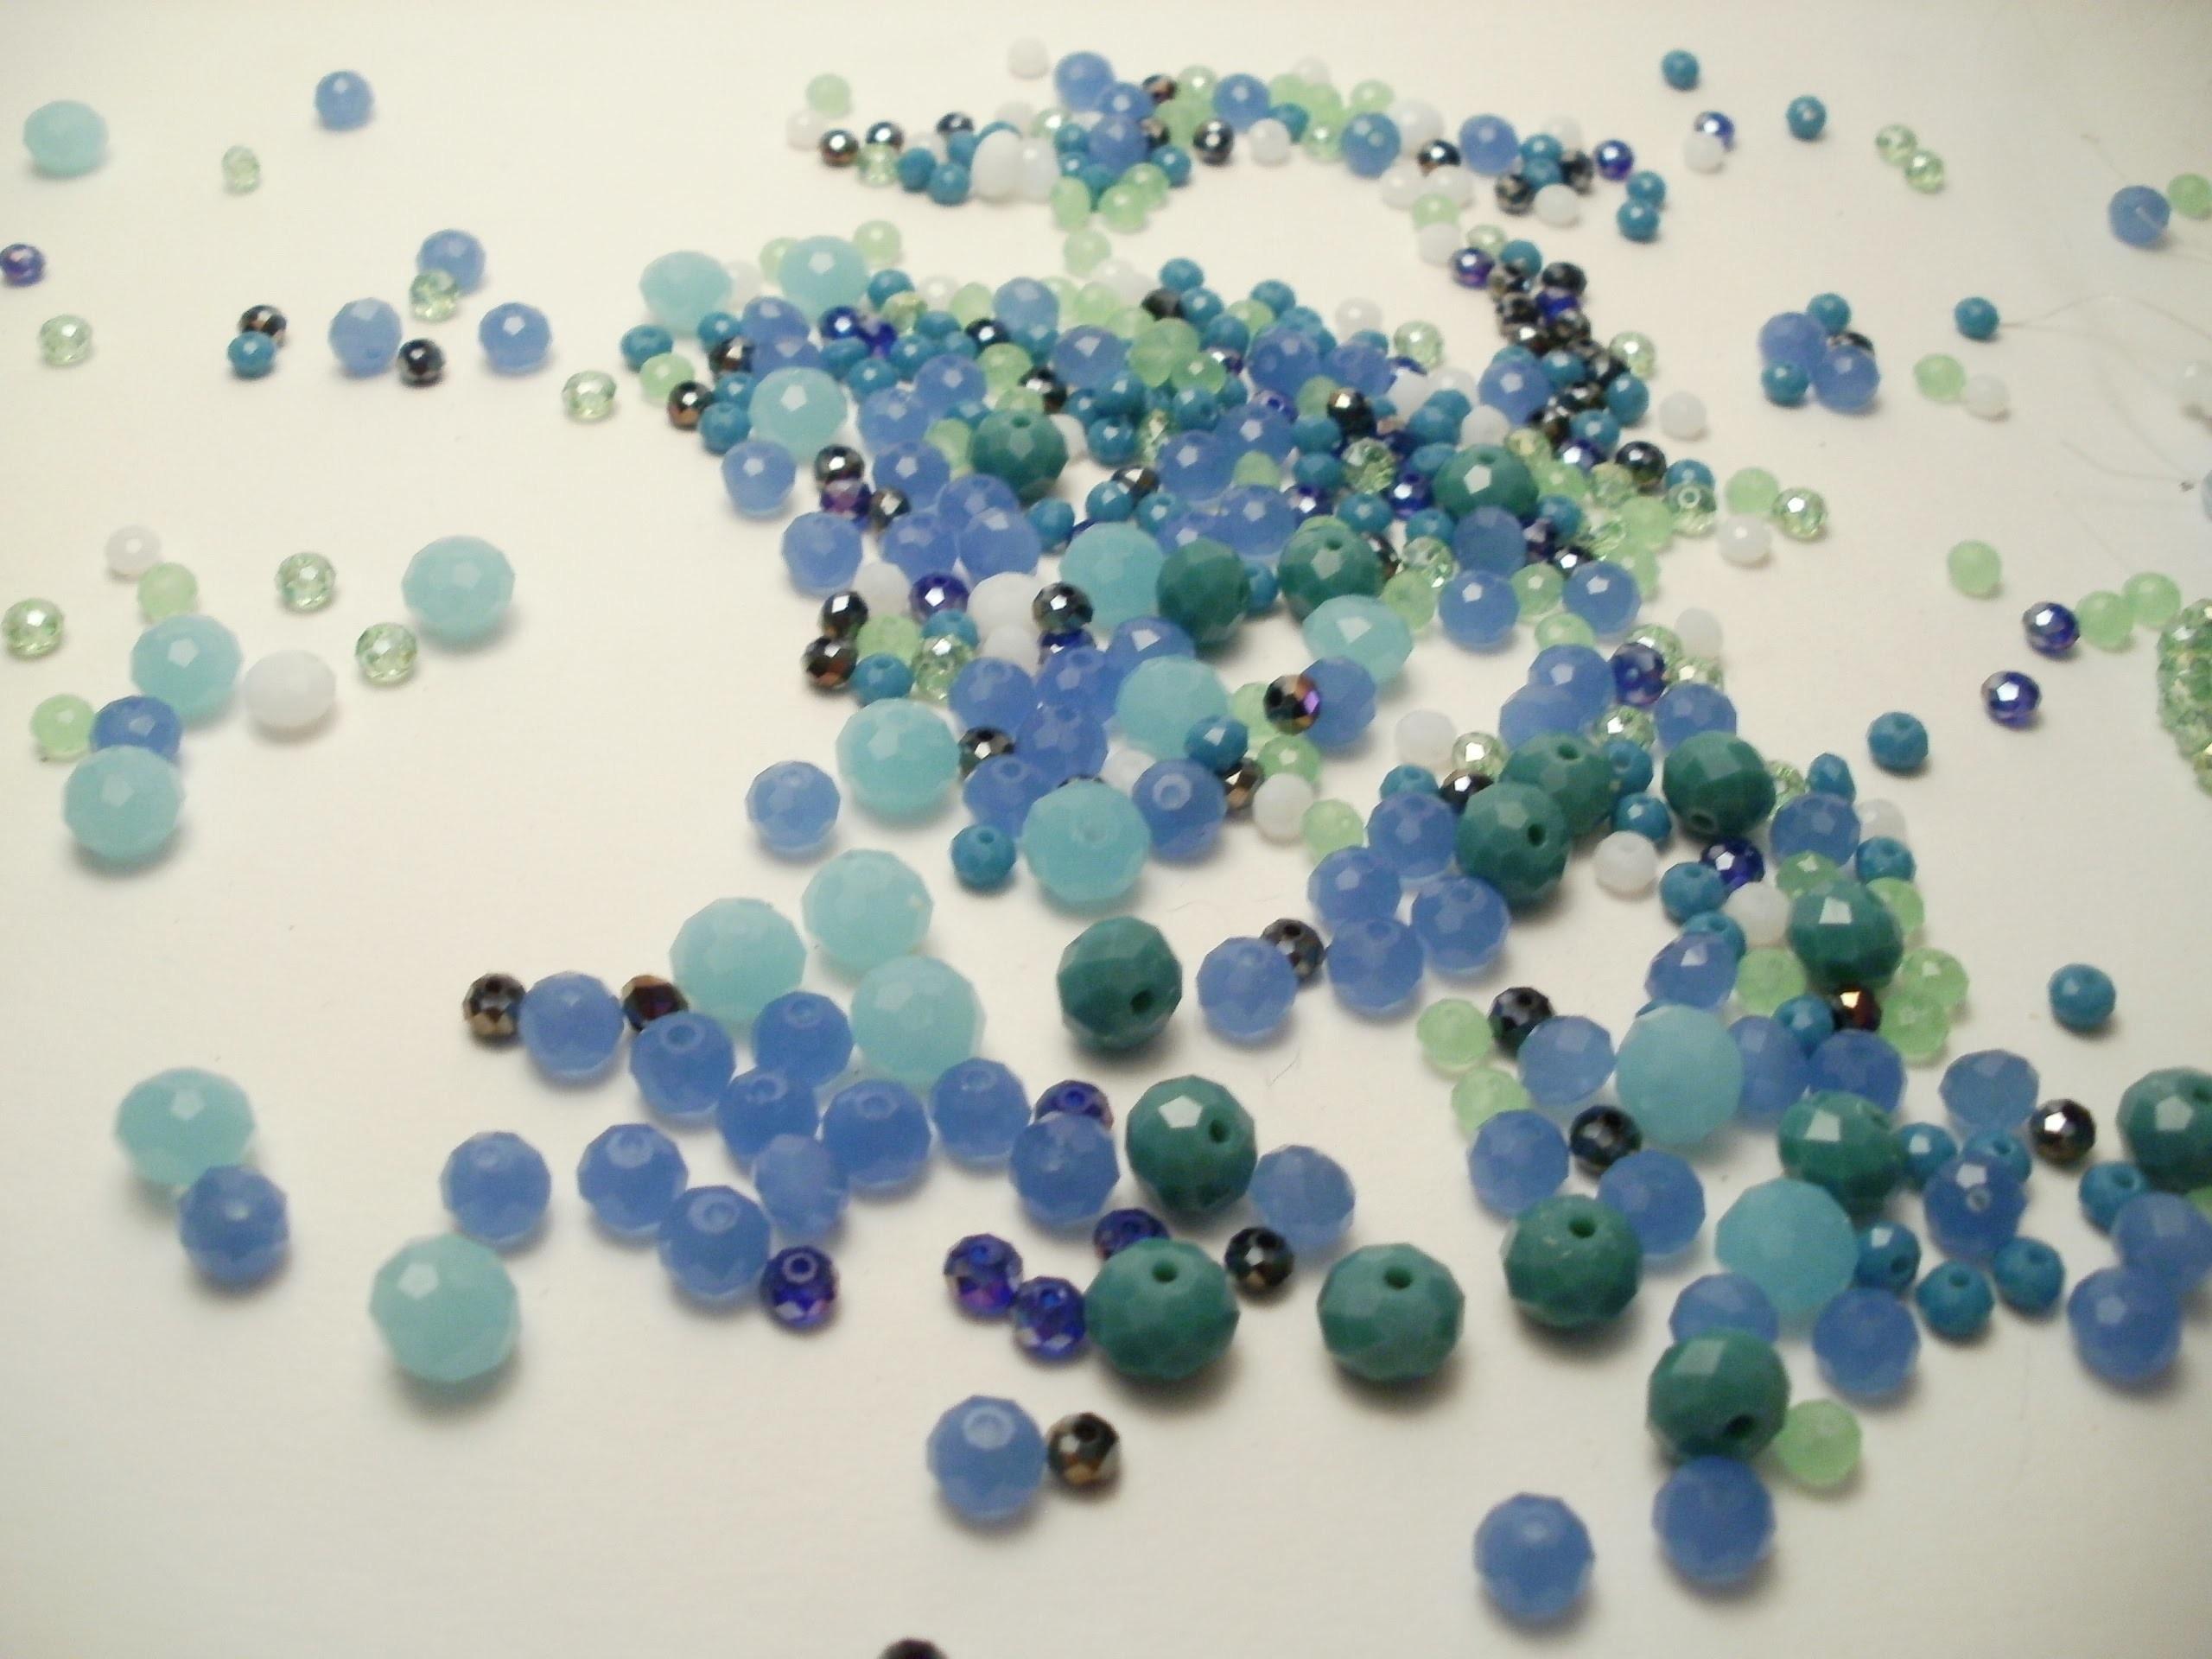 Acquisti di materiali per bigiotteria FAI DA TE a Genova | Negozi di perline in Liguria